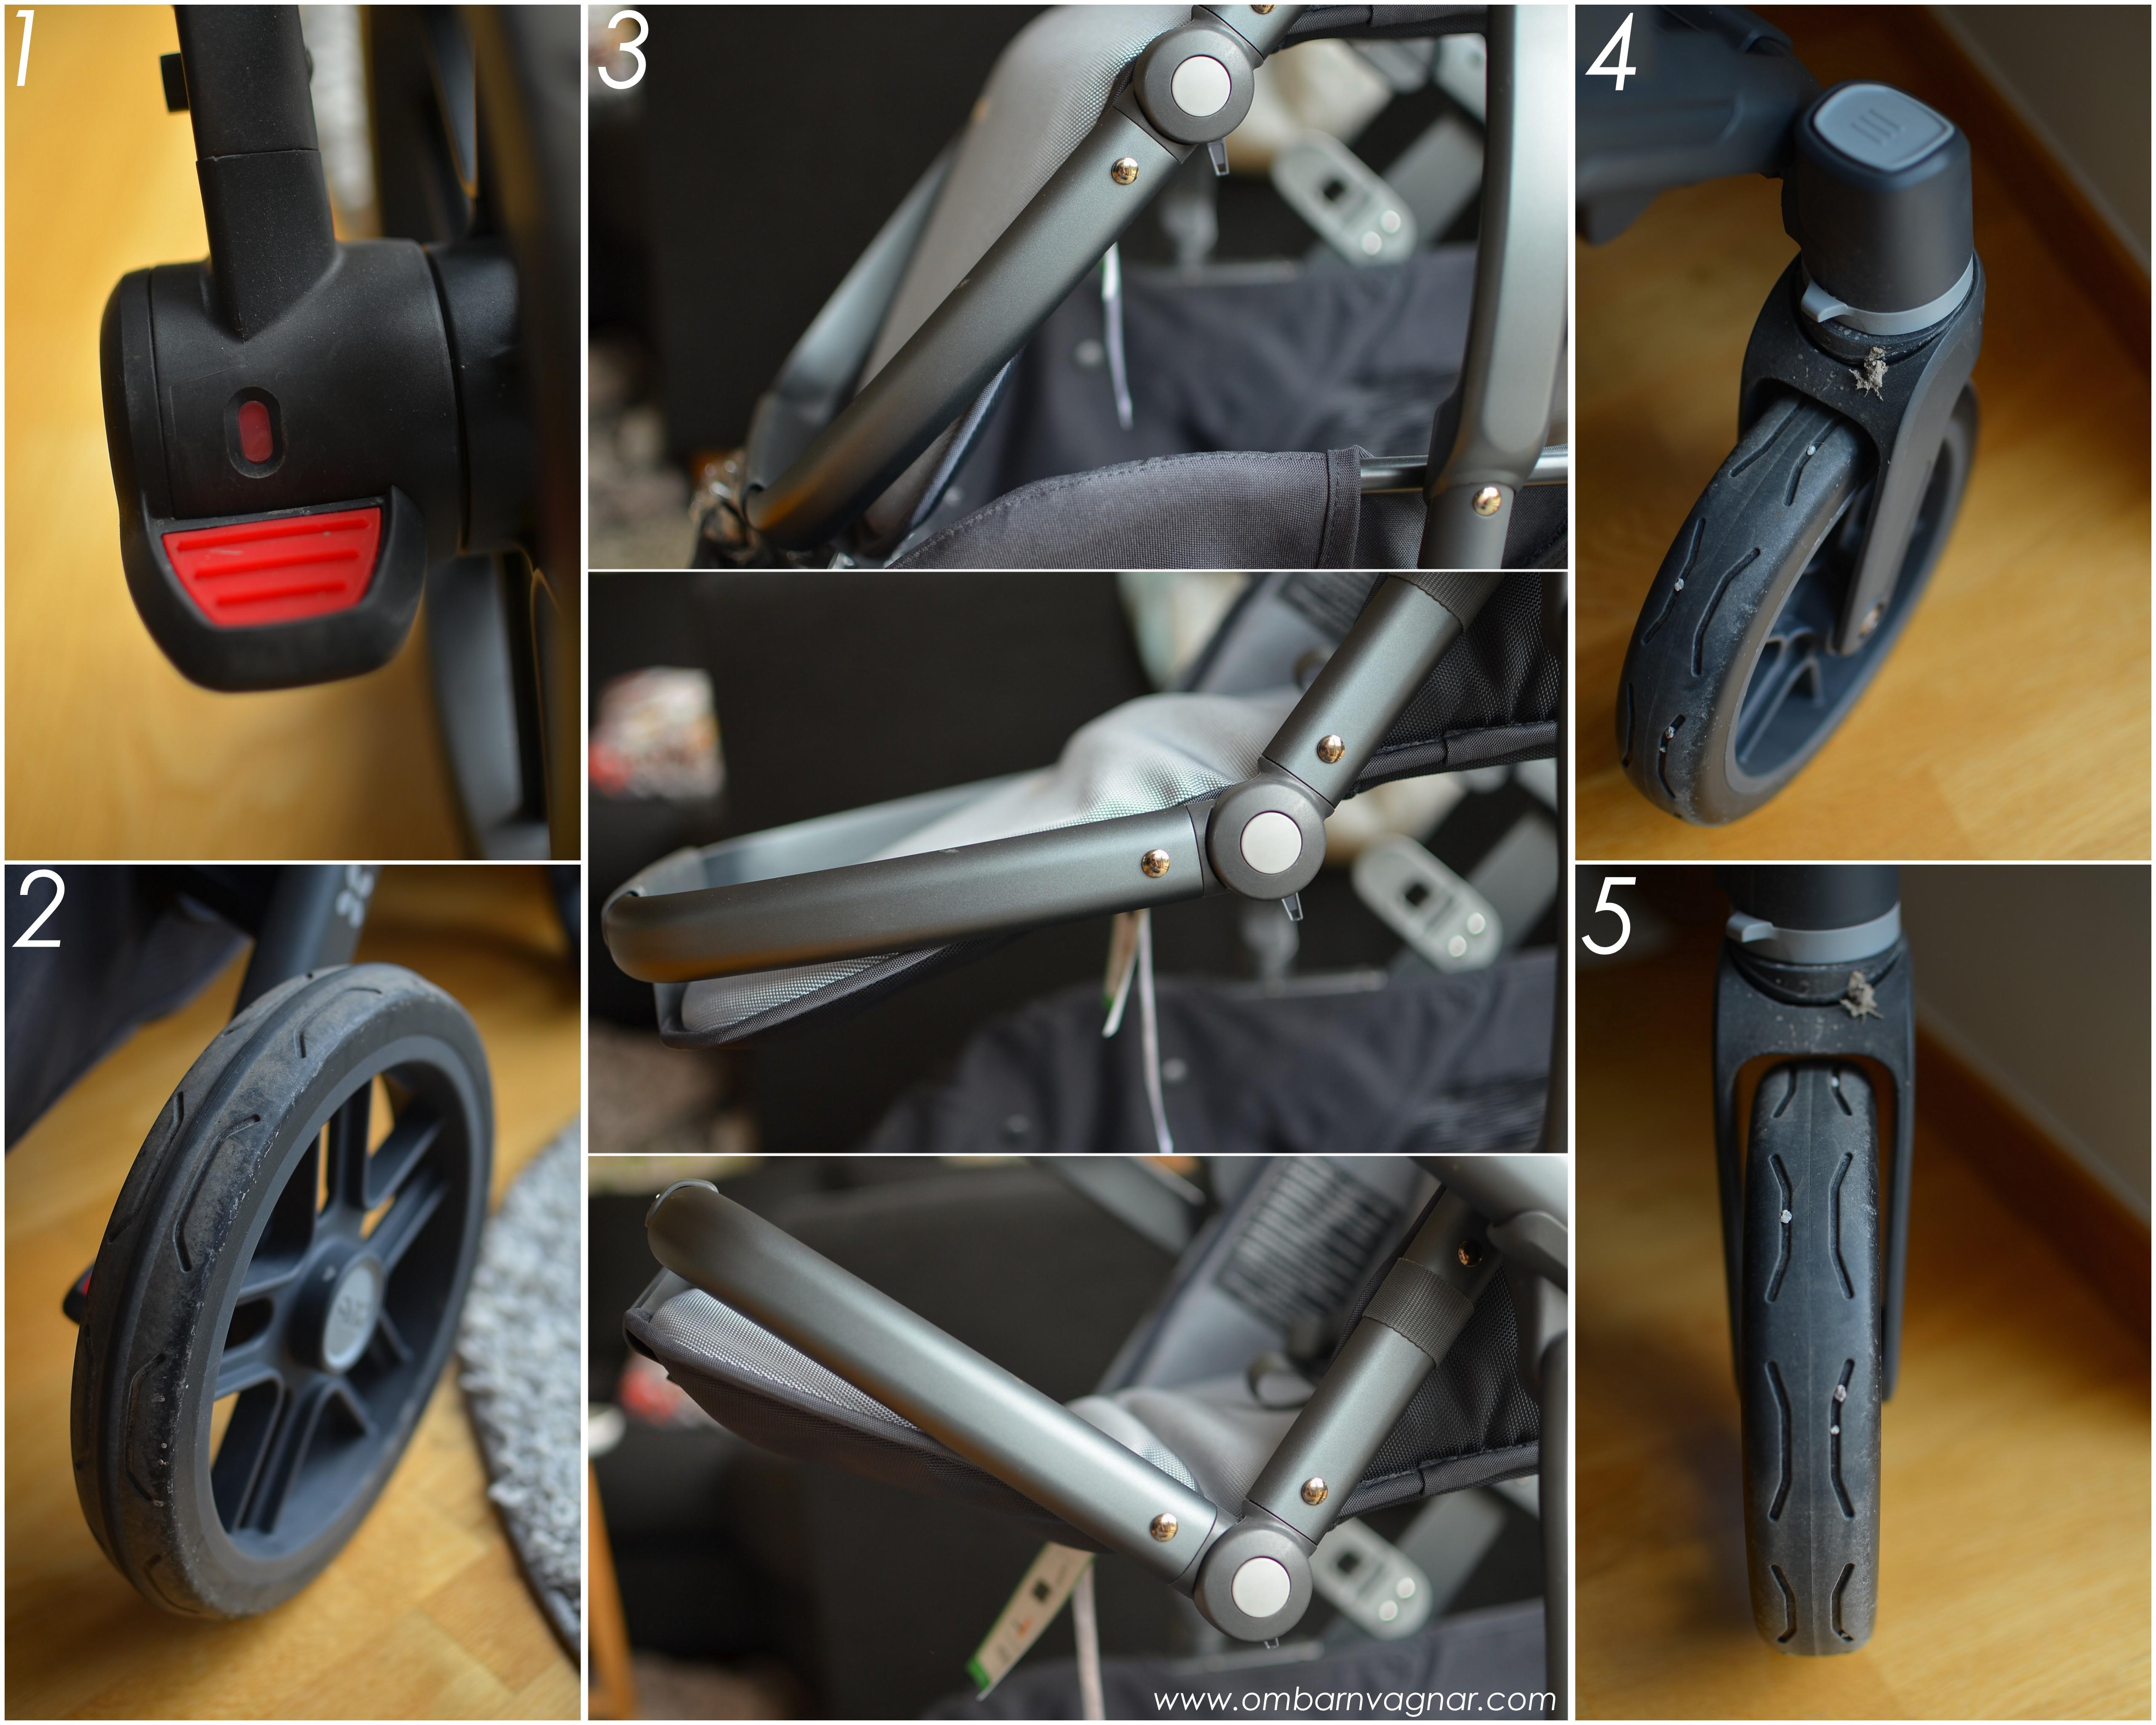 UPPAbaby-Vista-hjul-fotstod